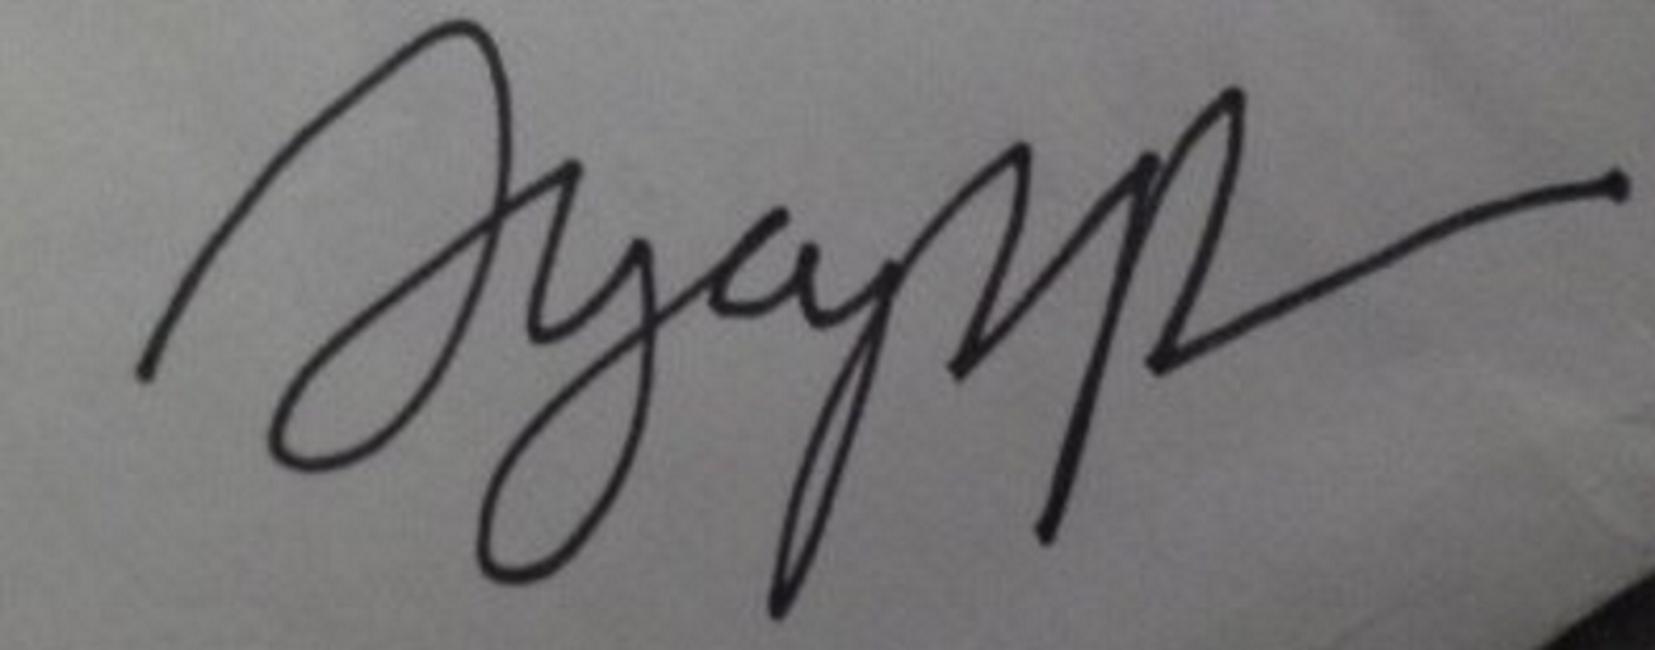 jay aloy Signature